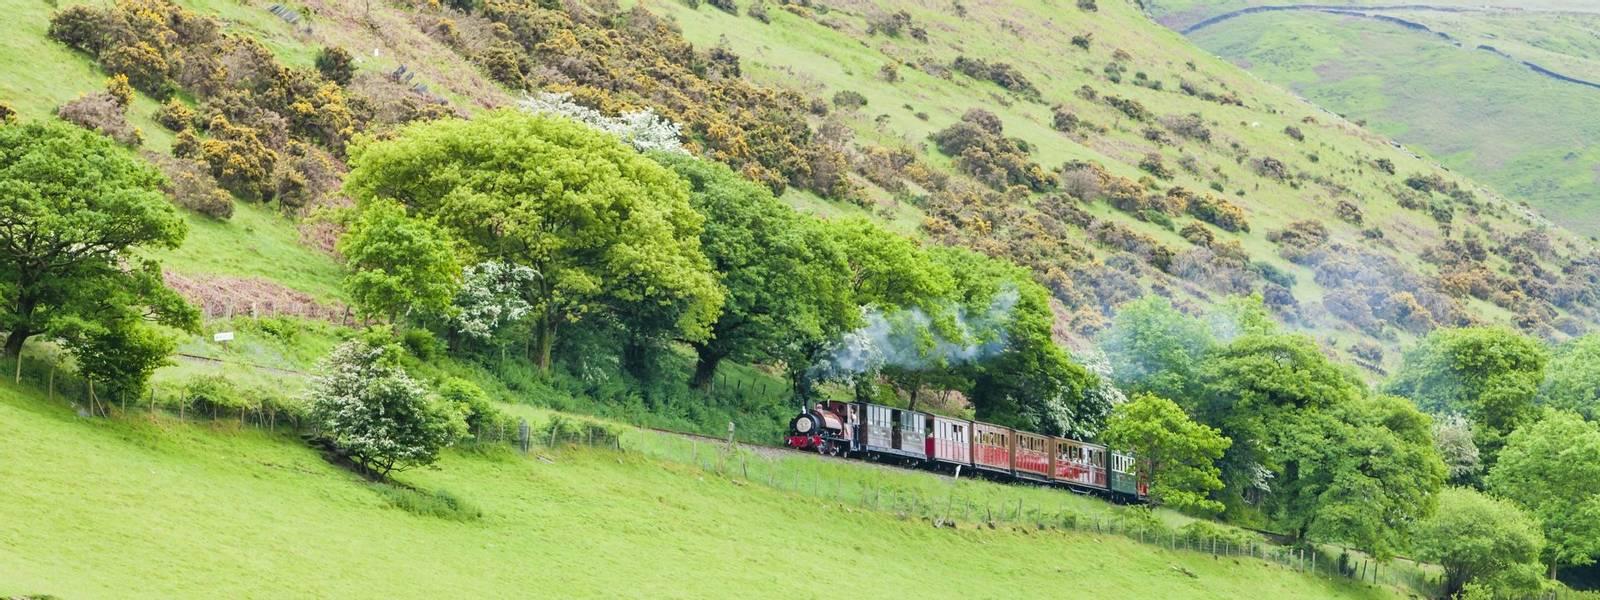 Southern Snowdonia - Dolgellau - Walking with Sightseeing - AdobeStock_59432755.jpeg